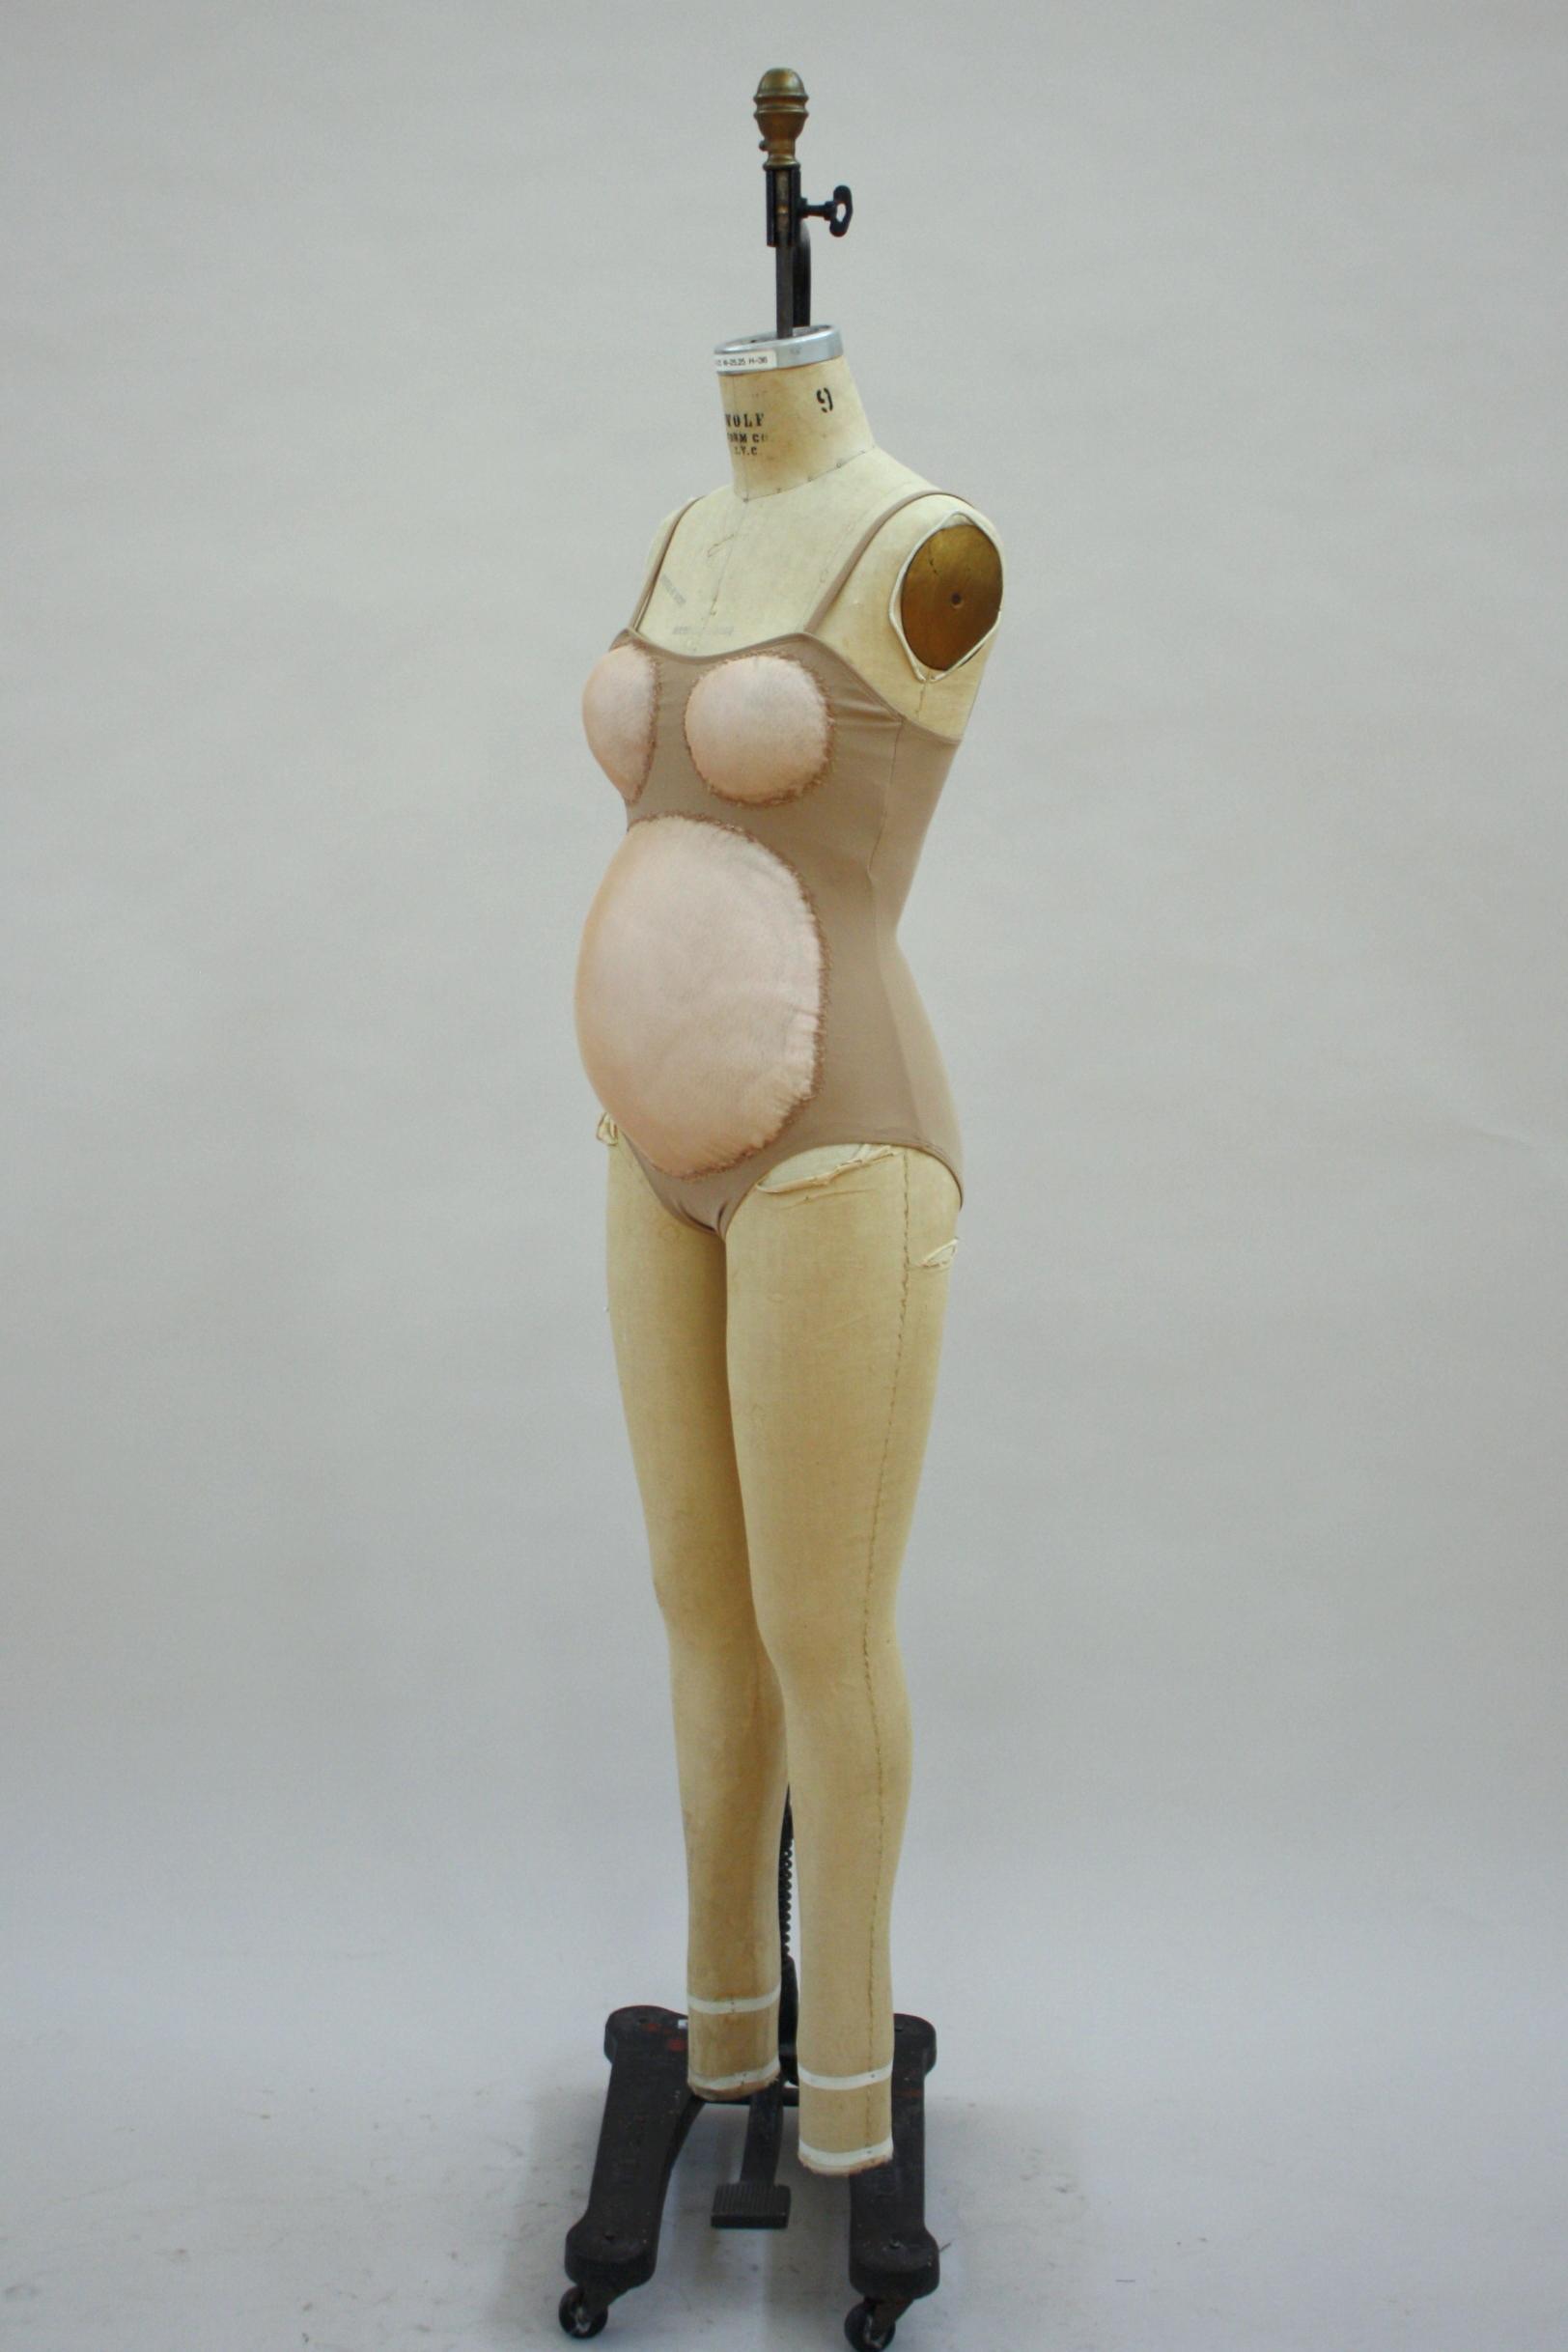 Pregnancy Pad